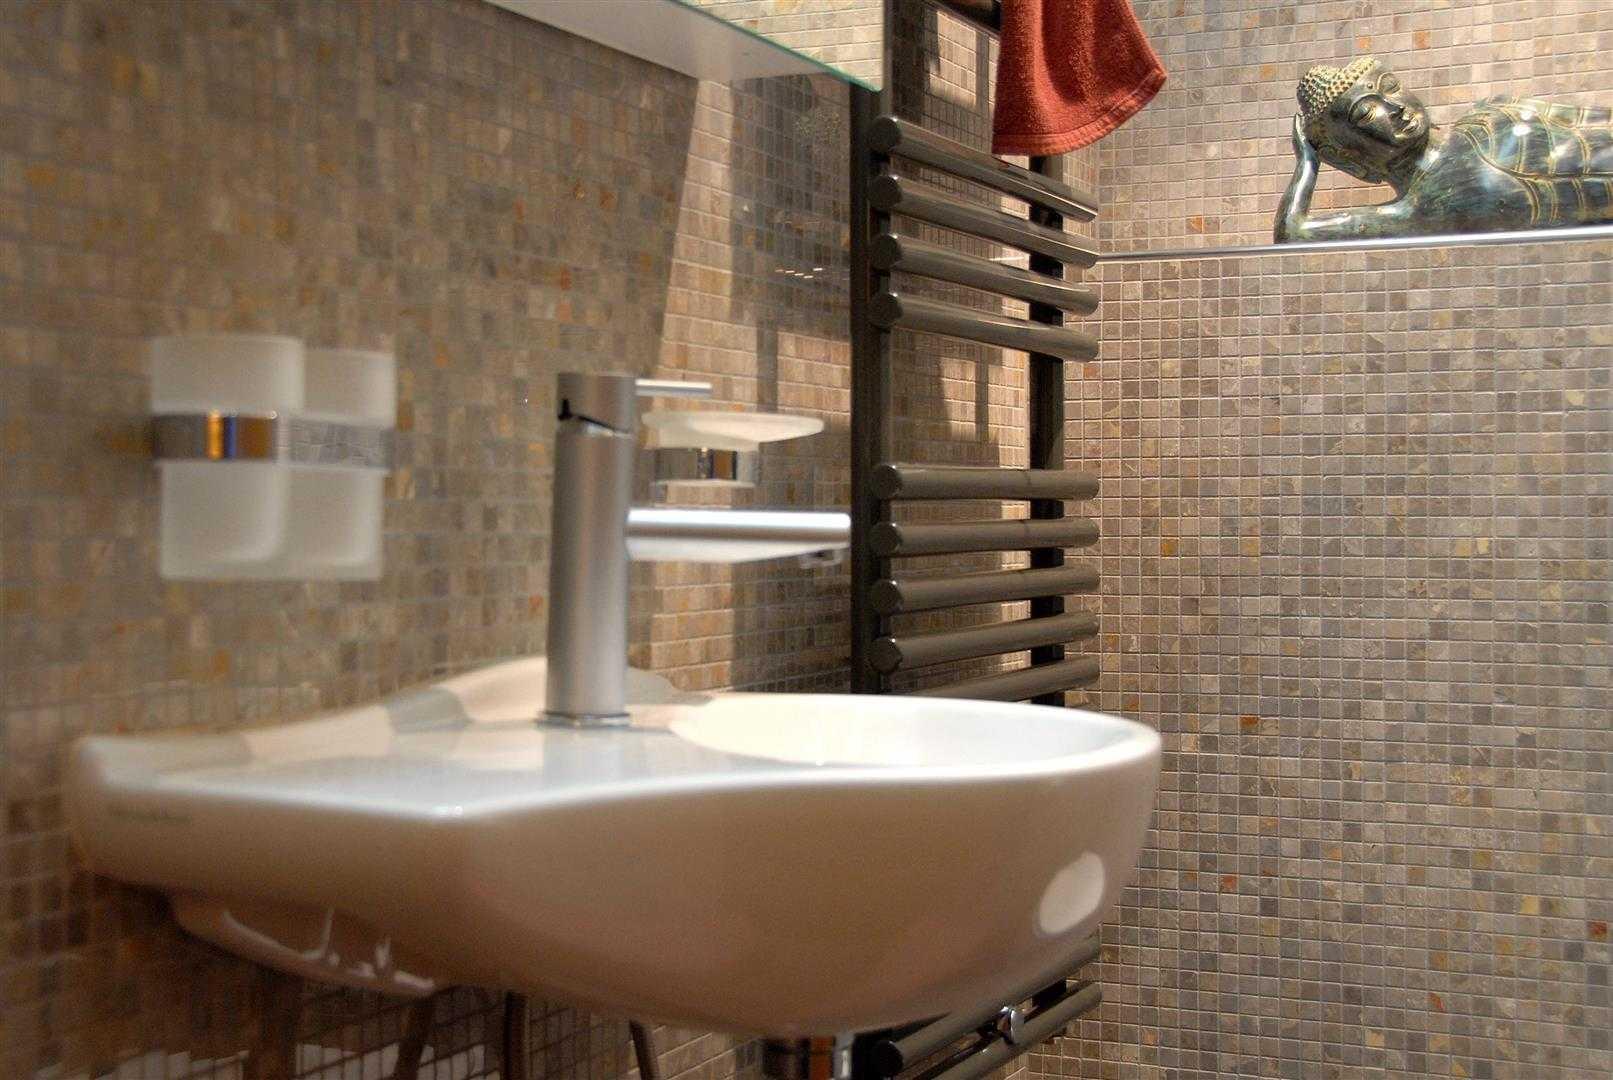 Agung Budi Raharsa | Architecture & Engineering Lenk Hotel - Switzerland Switzerland Switzerland Bathroom-4 Minimalis  12777